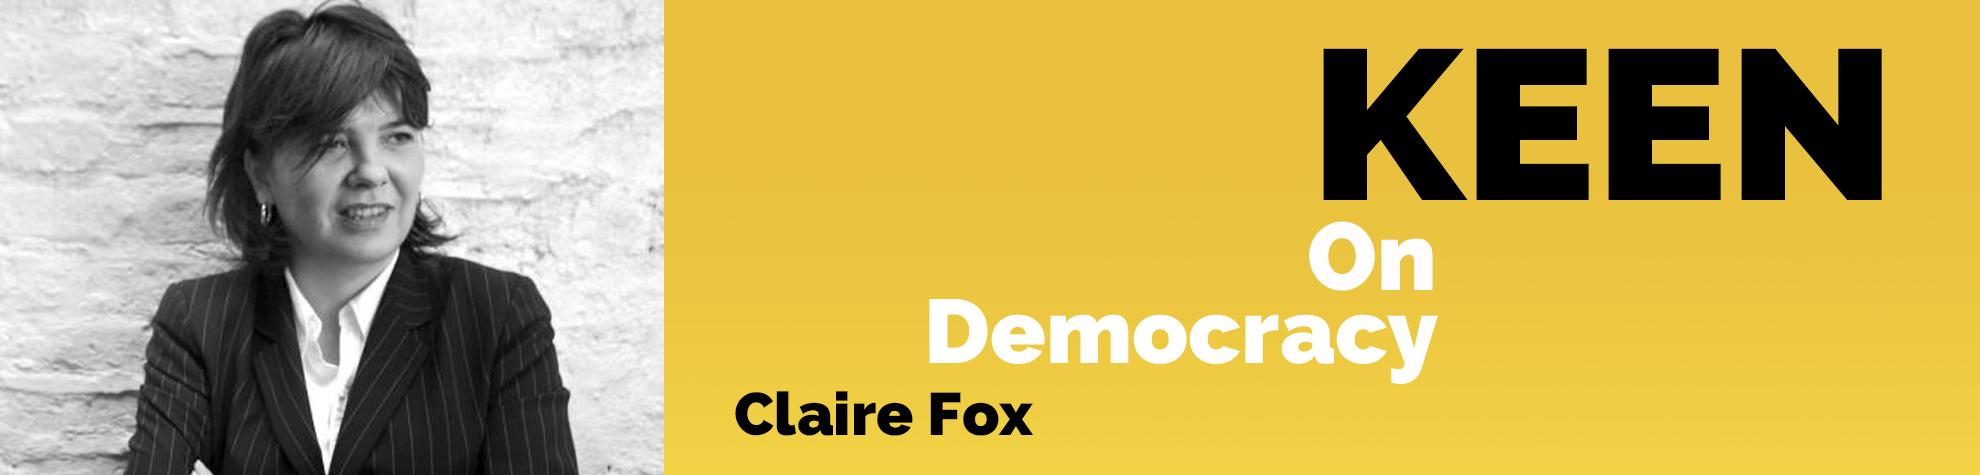 Claire fox.jpg